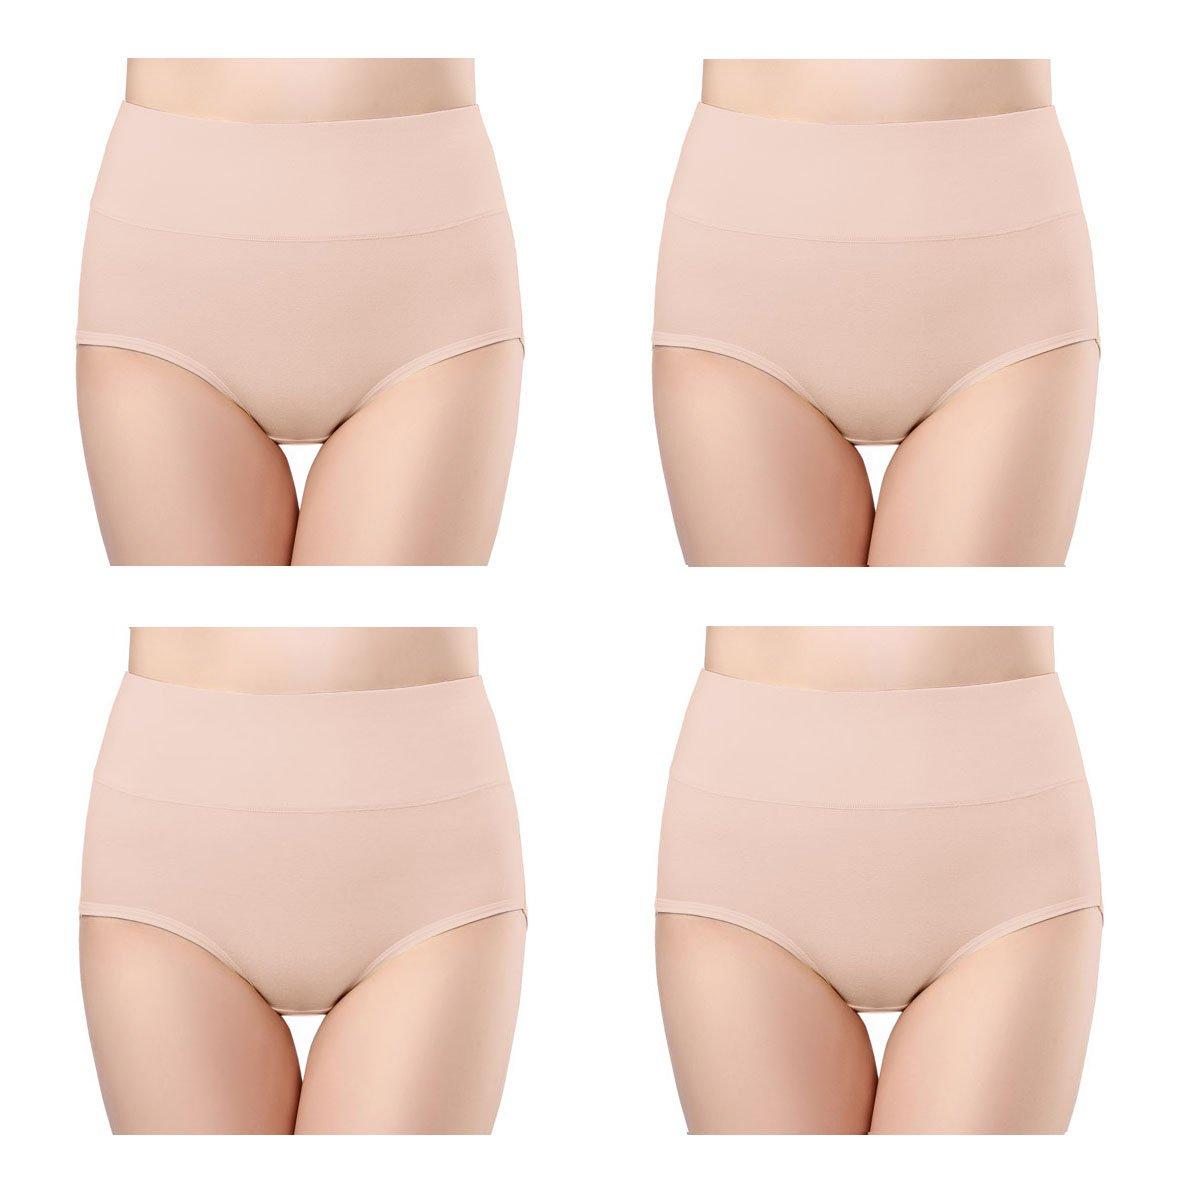 wirarpa Womens 4 Pack Soft High Waist Bamboo Modal Underwear Plus Size Panties 2204